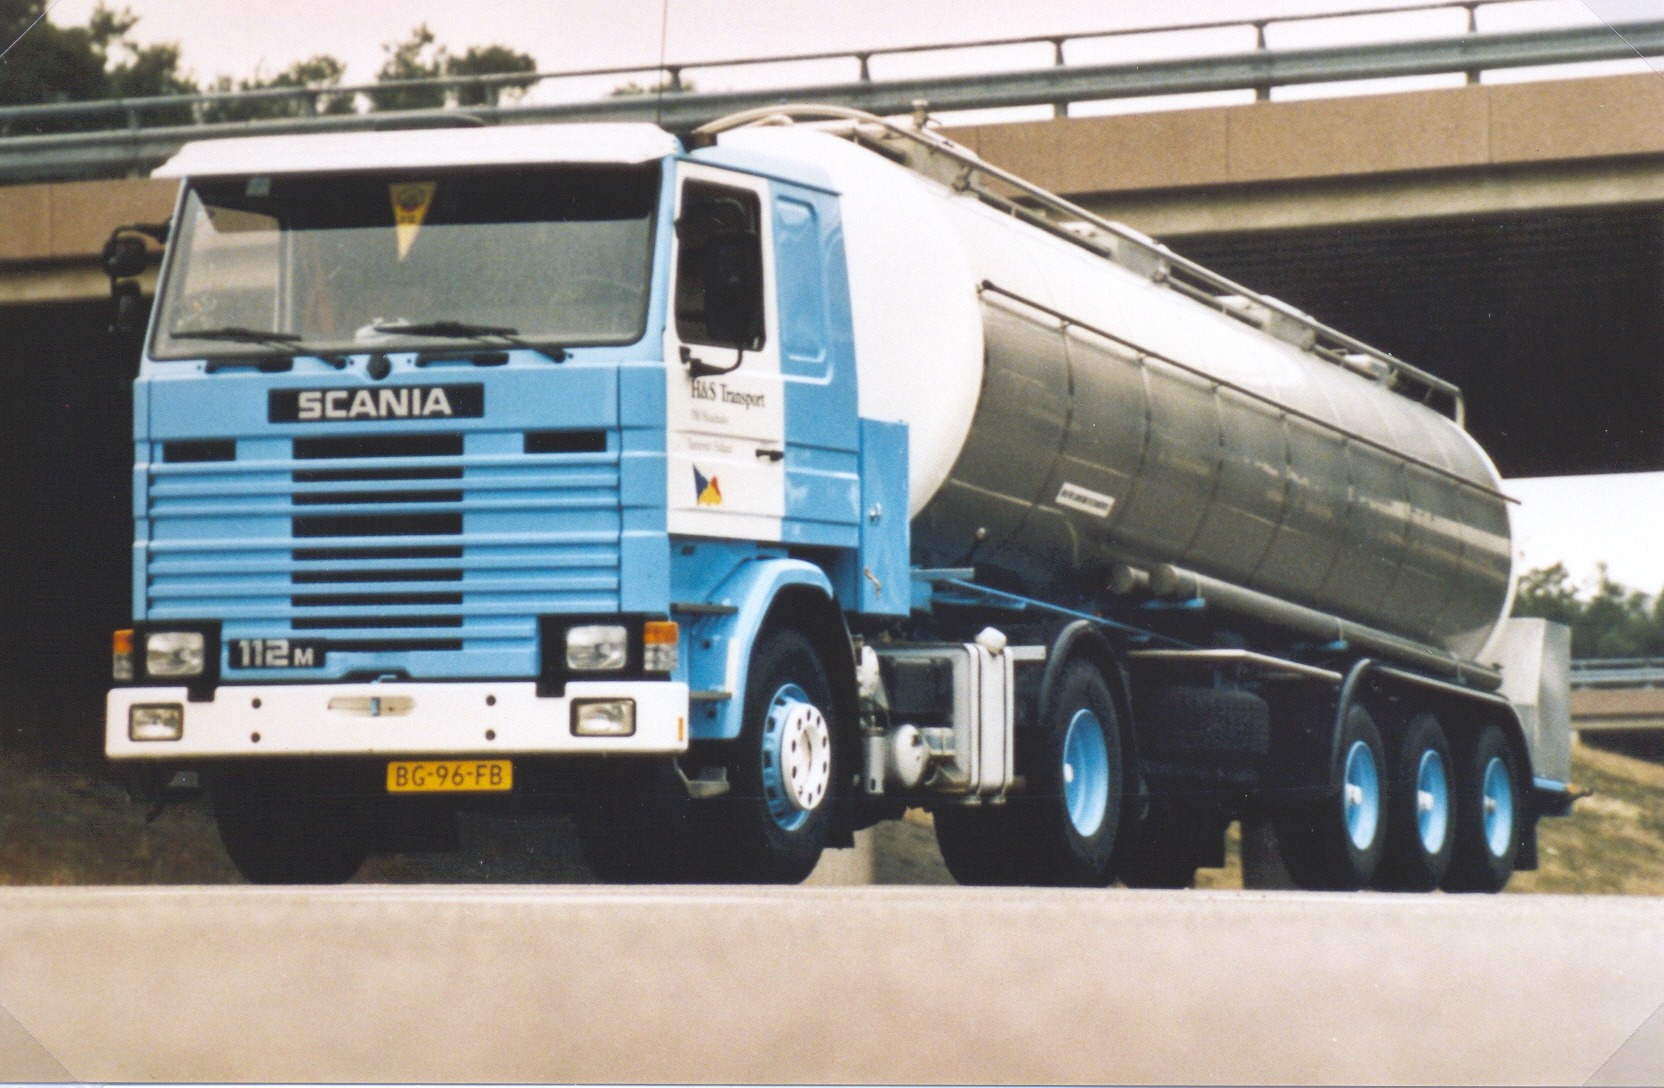 Scania--Gerjan-Crebolder-archief